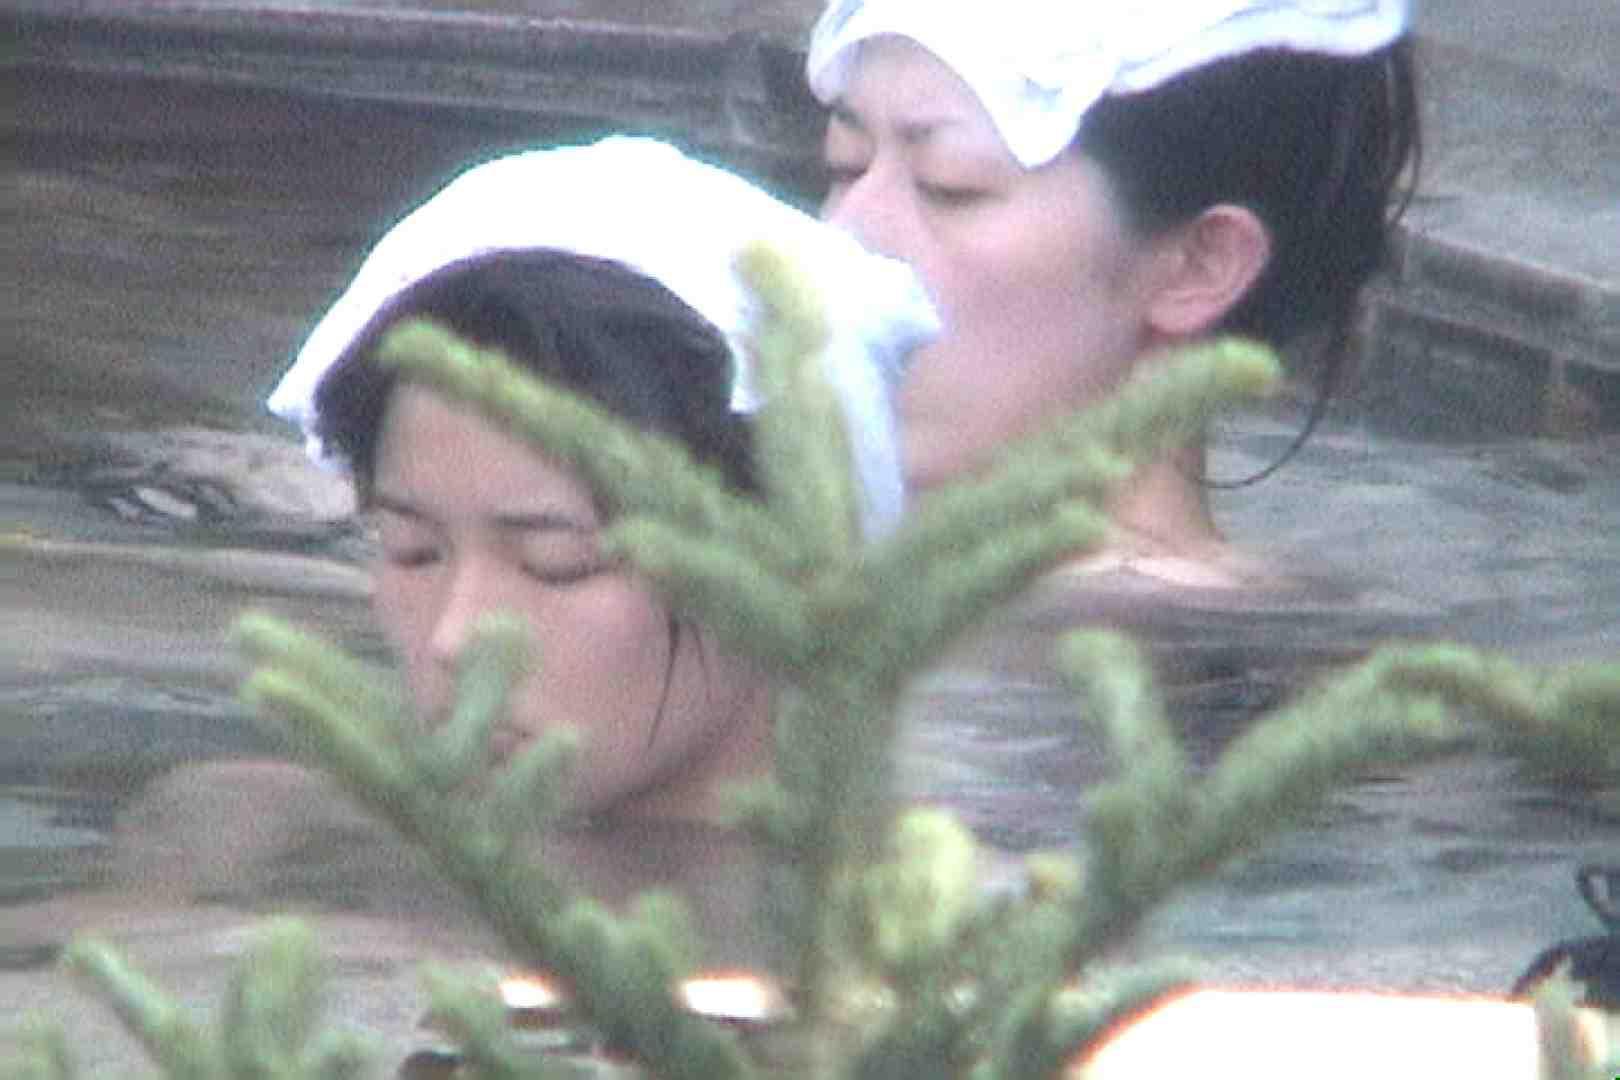 Aquaな露天風呂Vol.80【VIP限定】 盗撮 | HなOL  66pic 46